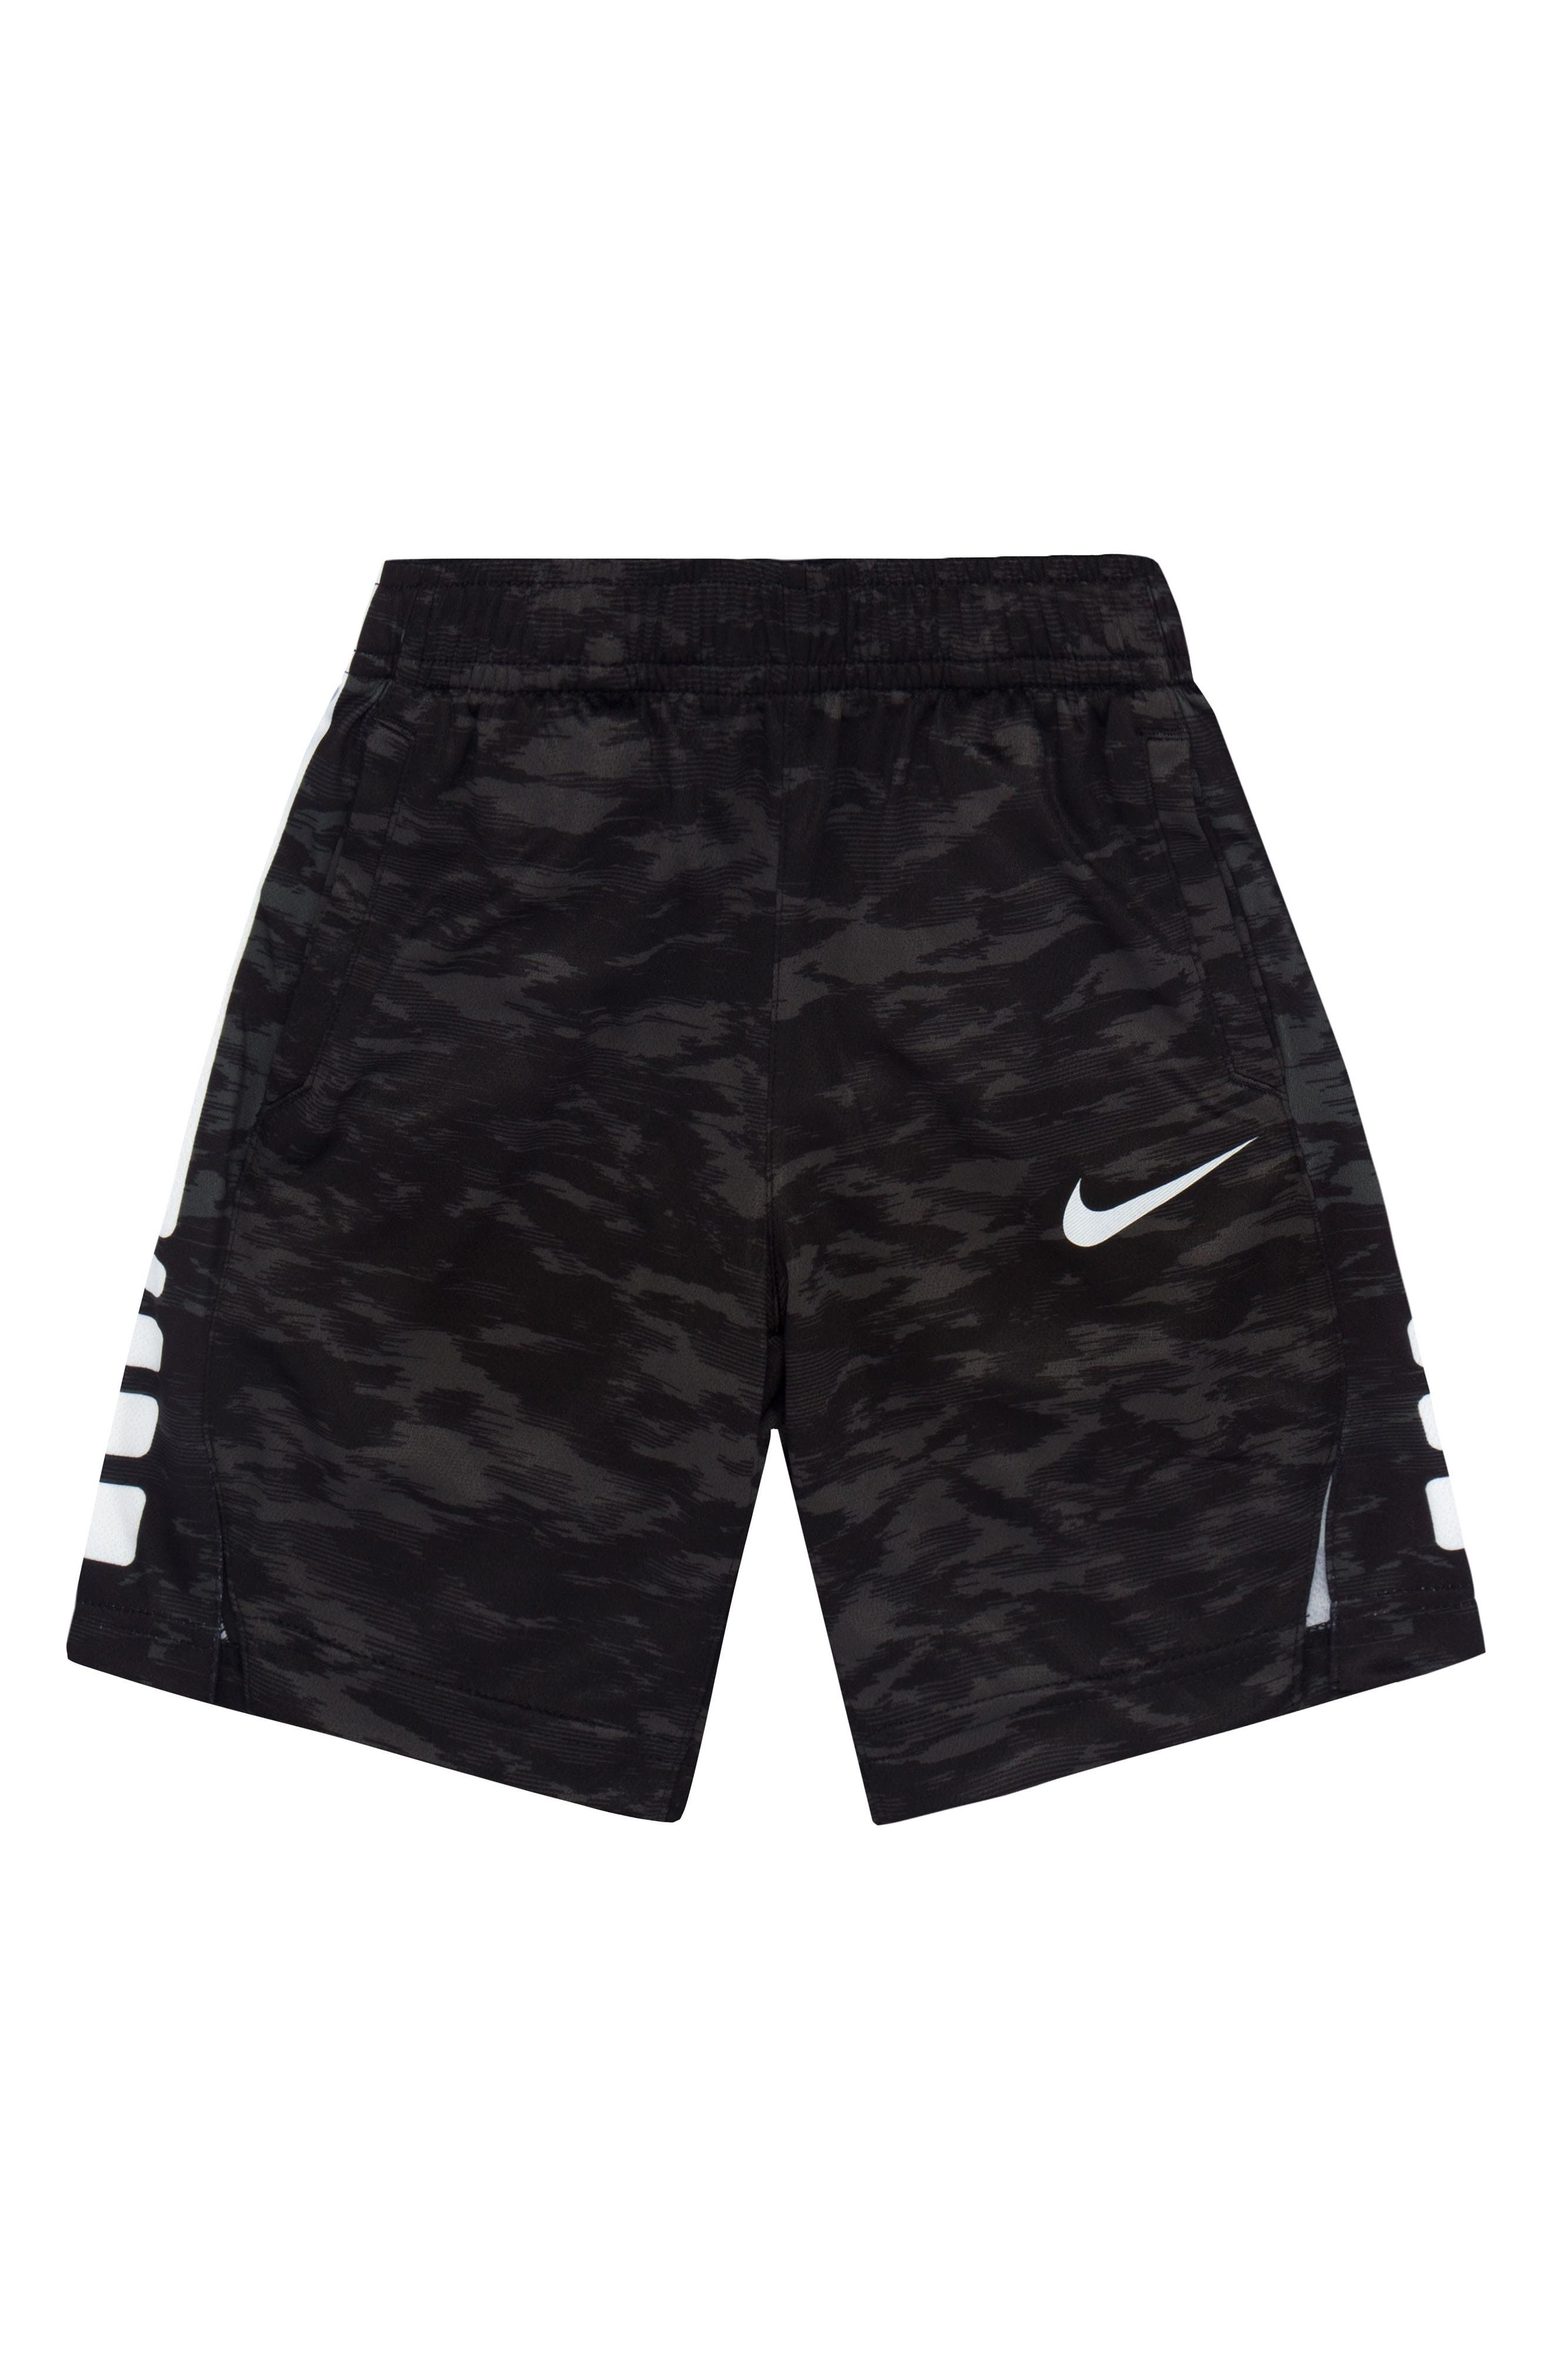 Alternate Image 1 Selected - Nike Vent AOP Shorts (Toddler Boys & Little Boys)